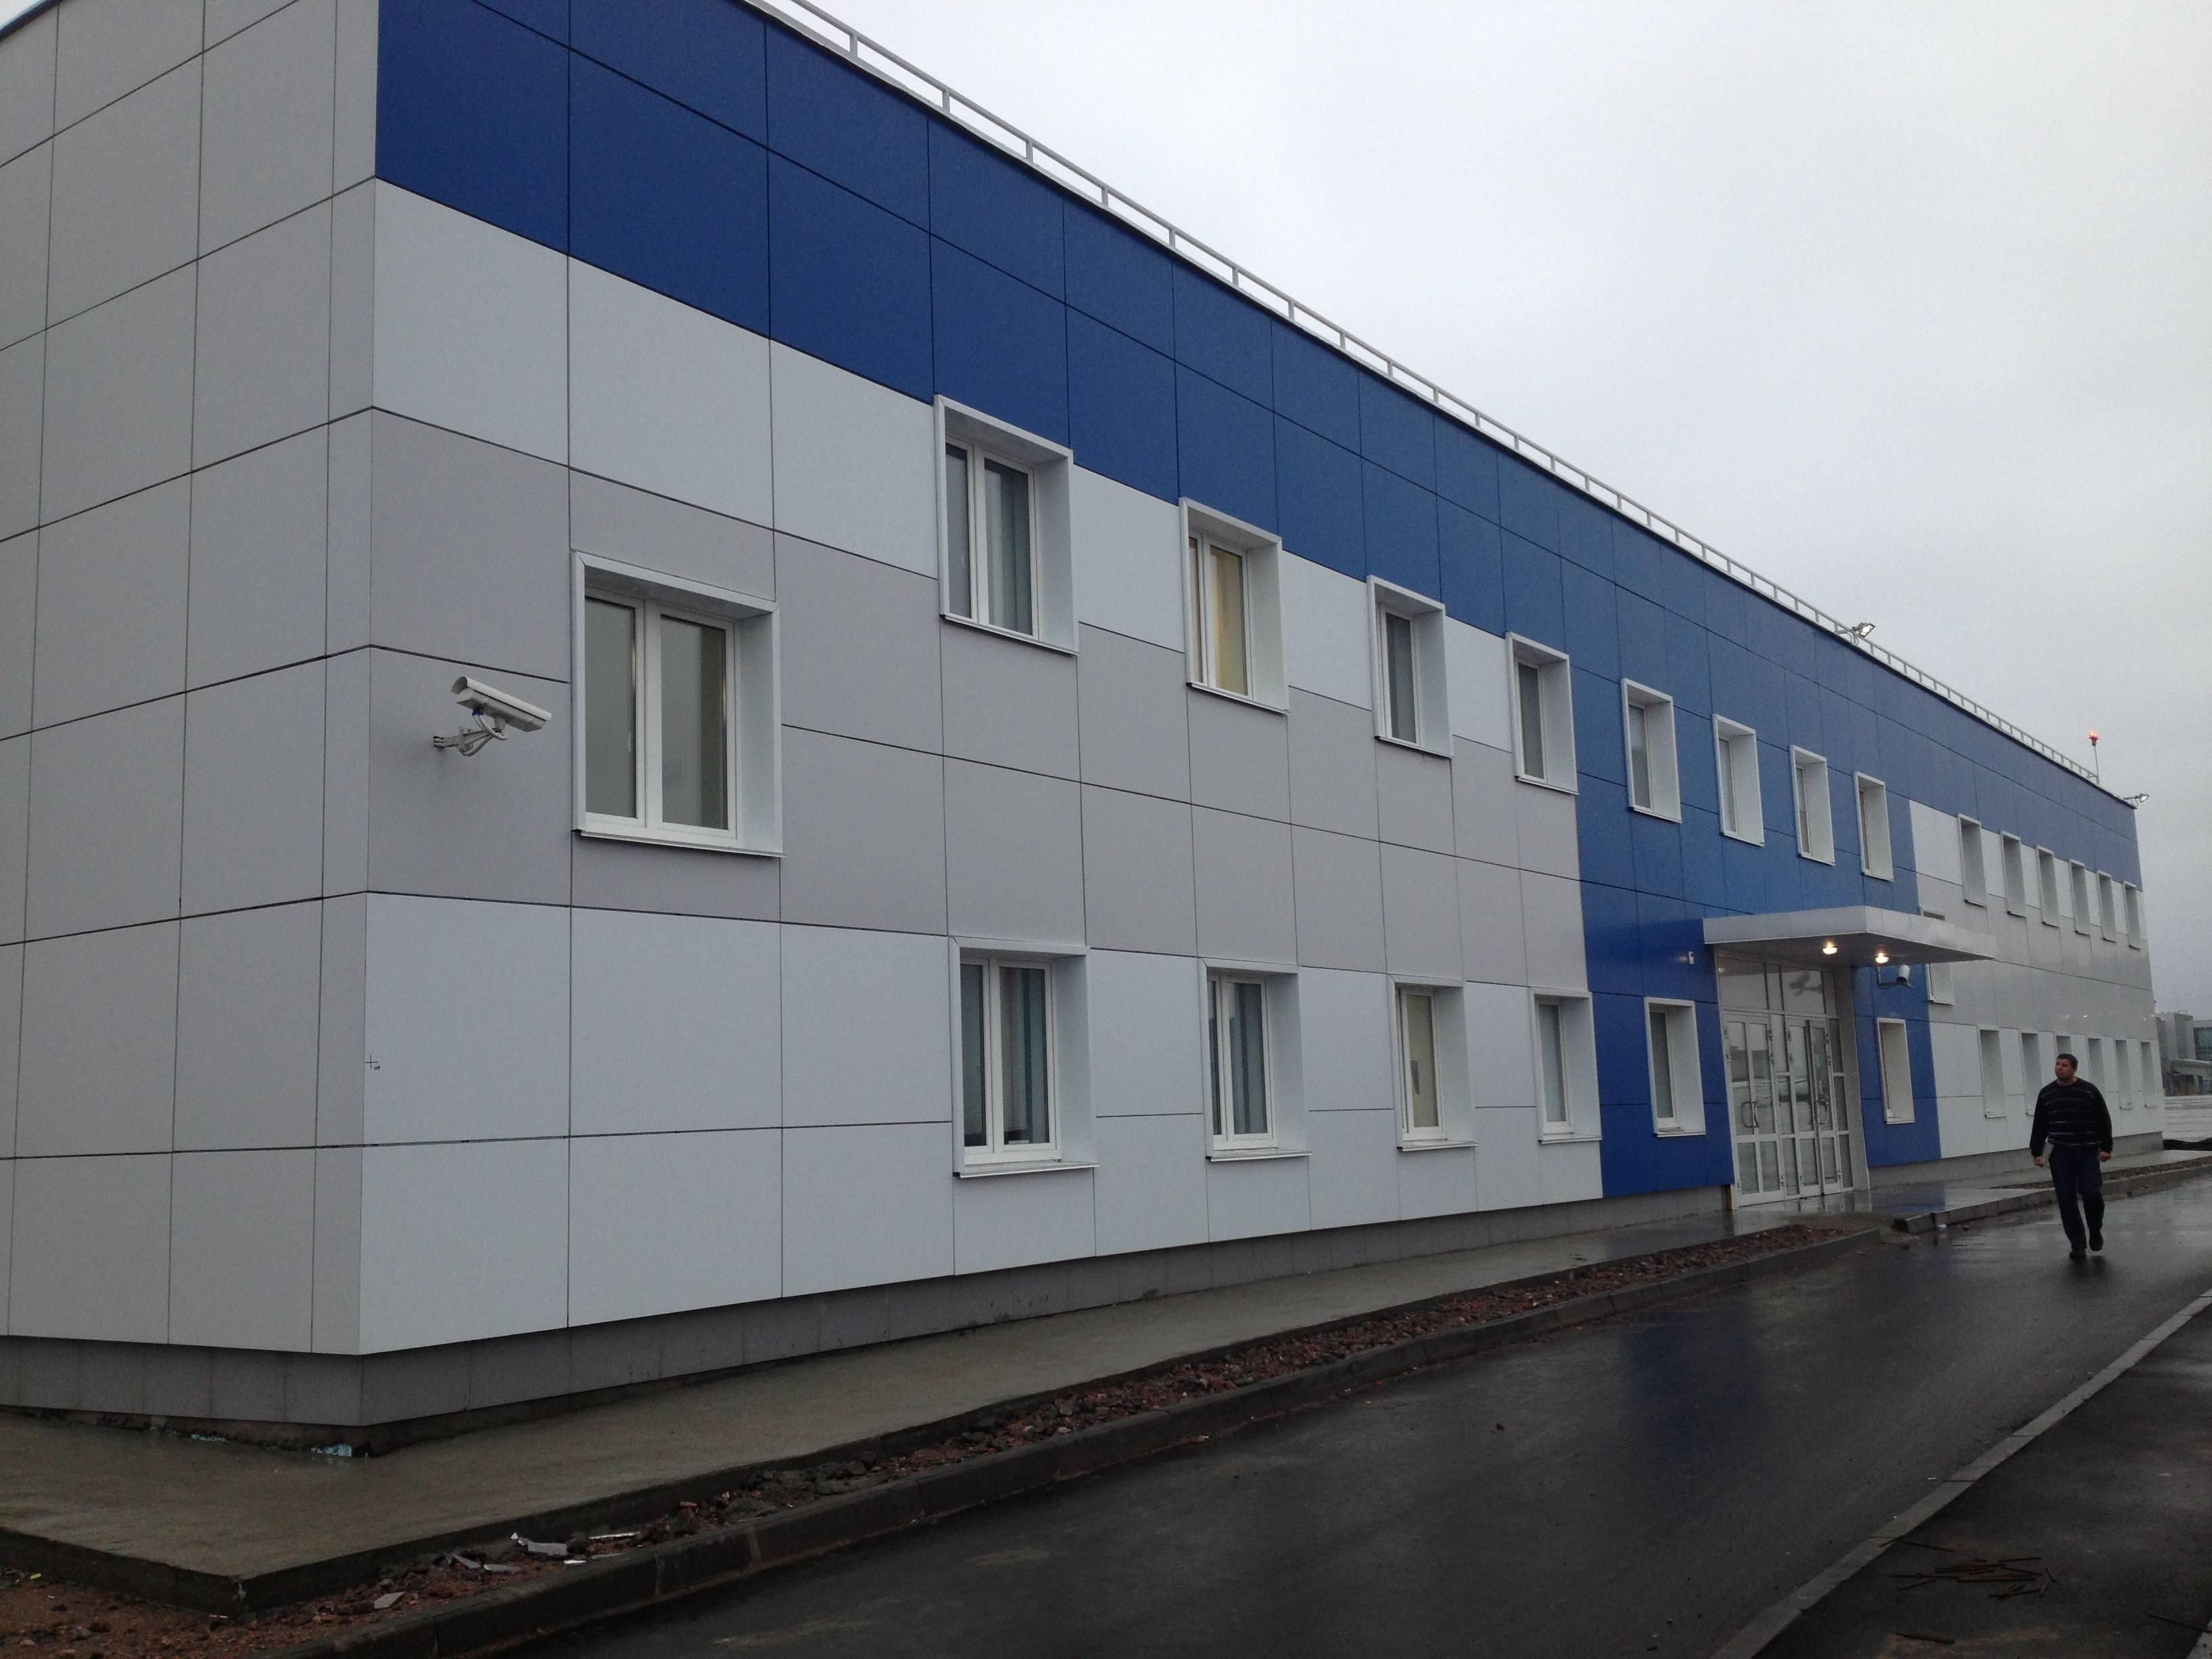 Pulkovo Airport GSE Building